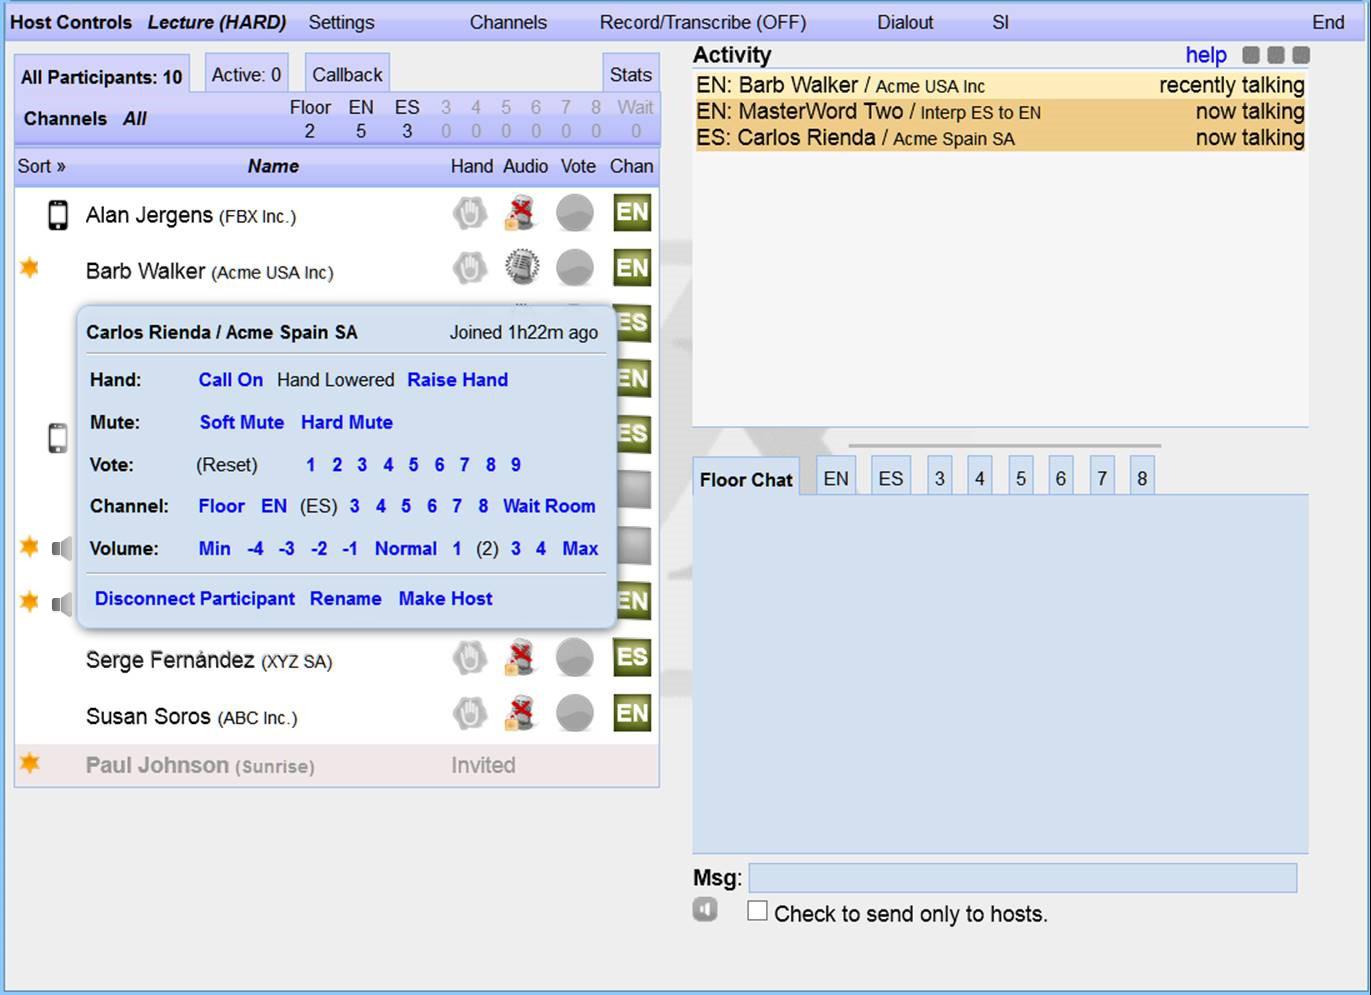 ZipDX screenshot